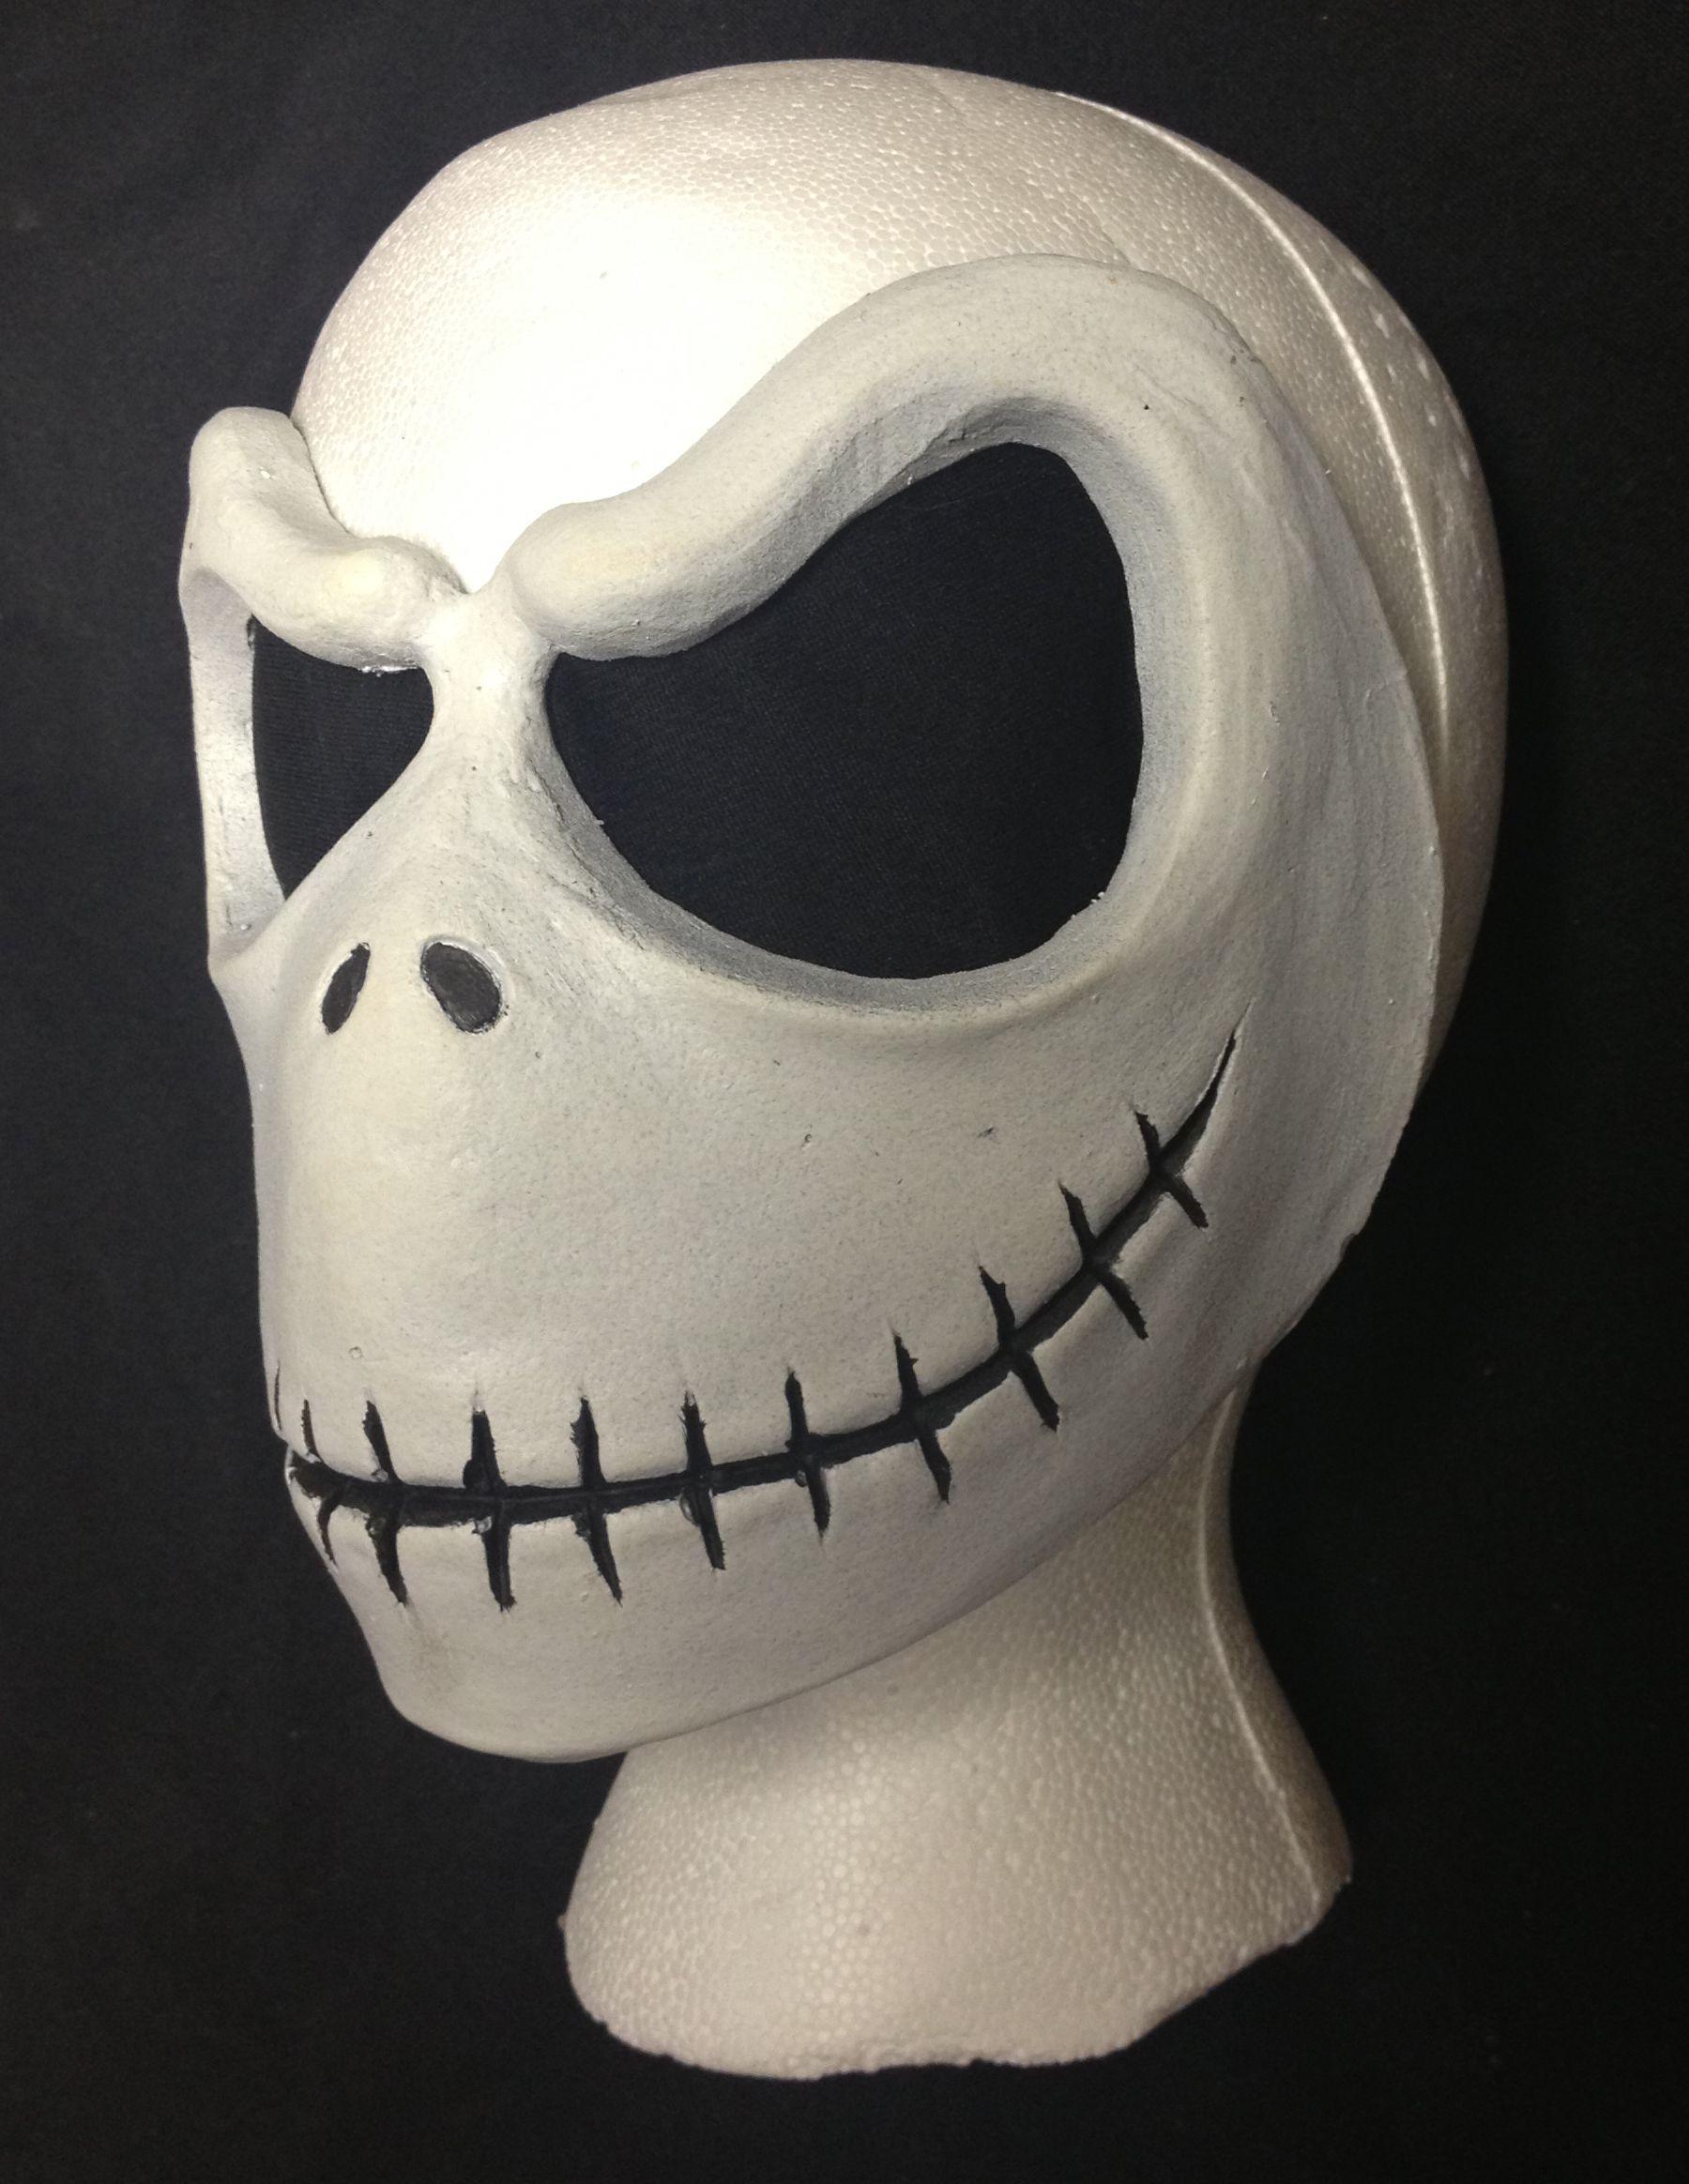 Malmey Studios Jack Skellington Face Mask Prosthetic! This